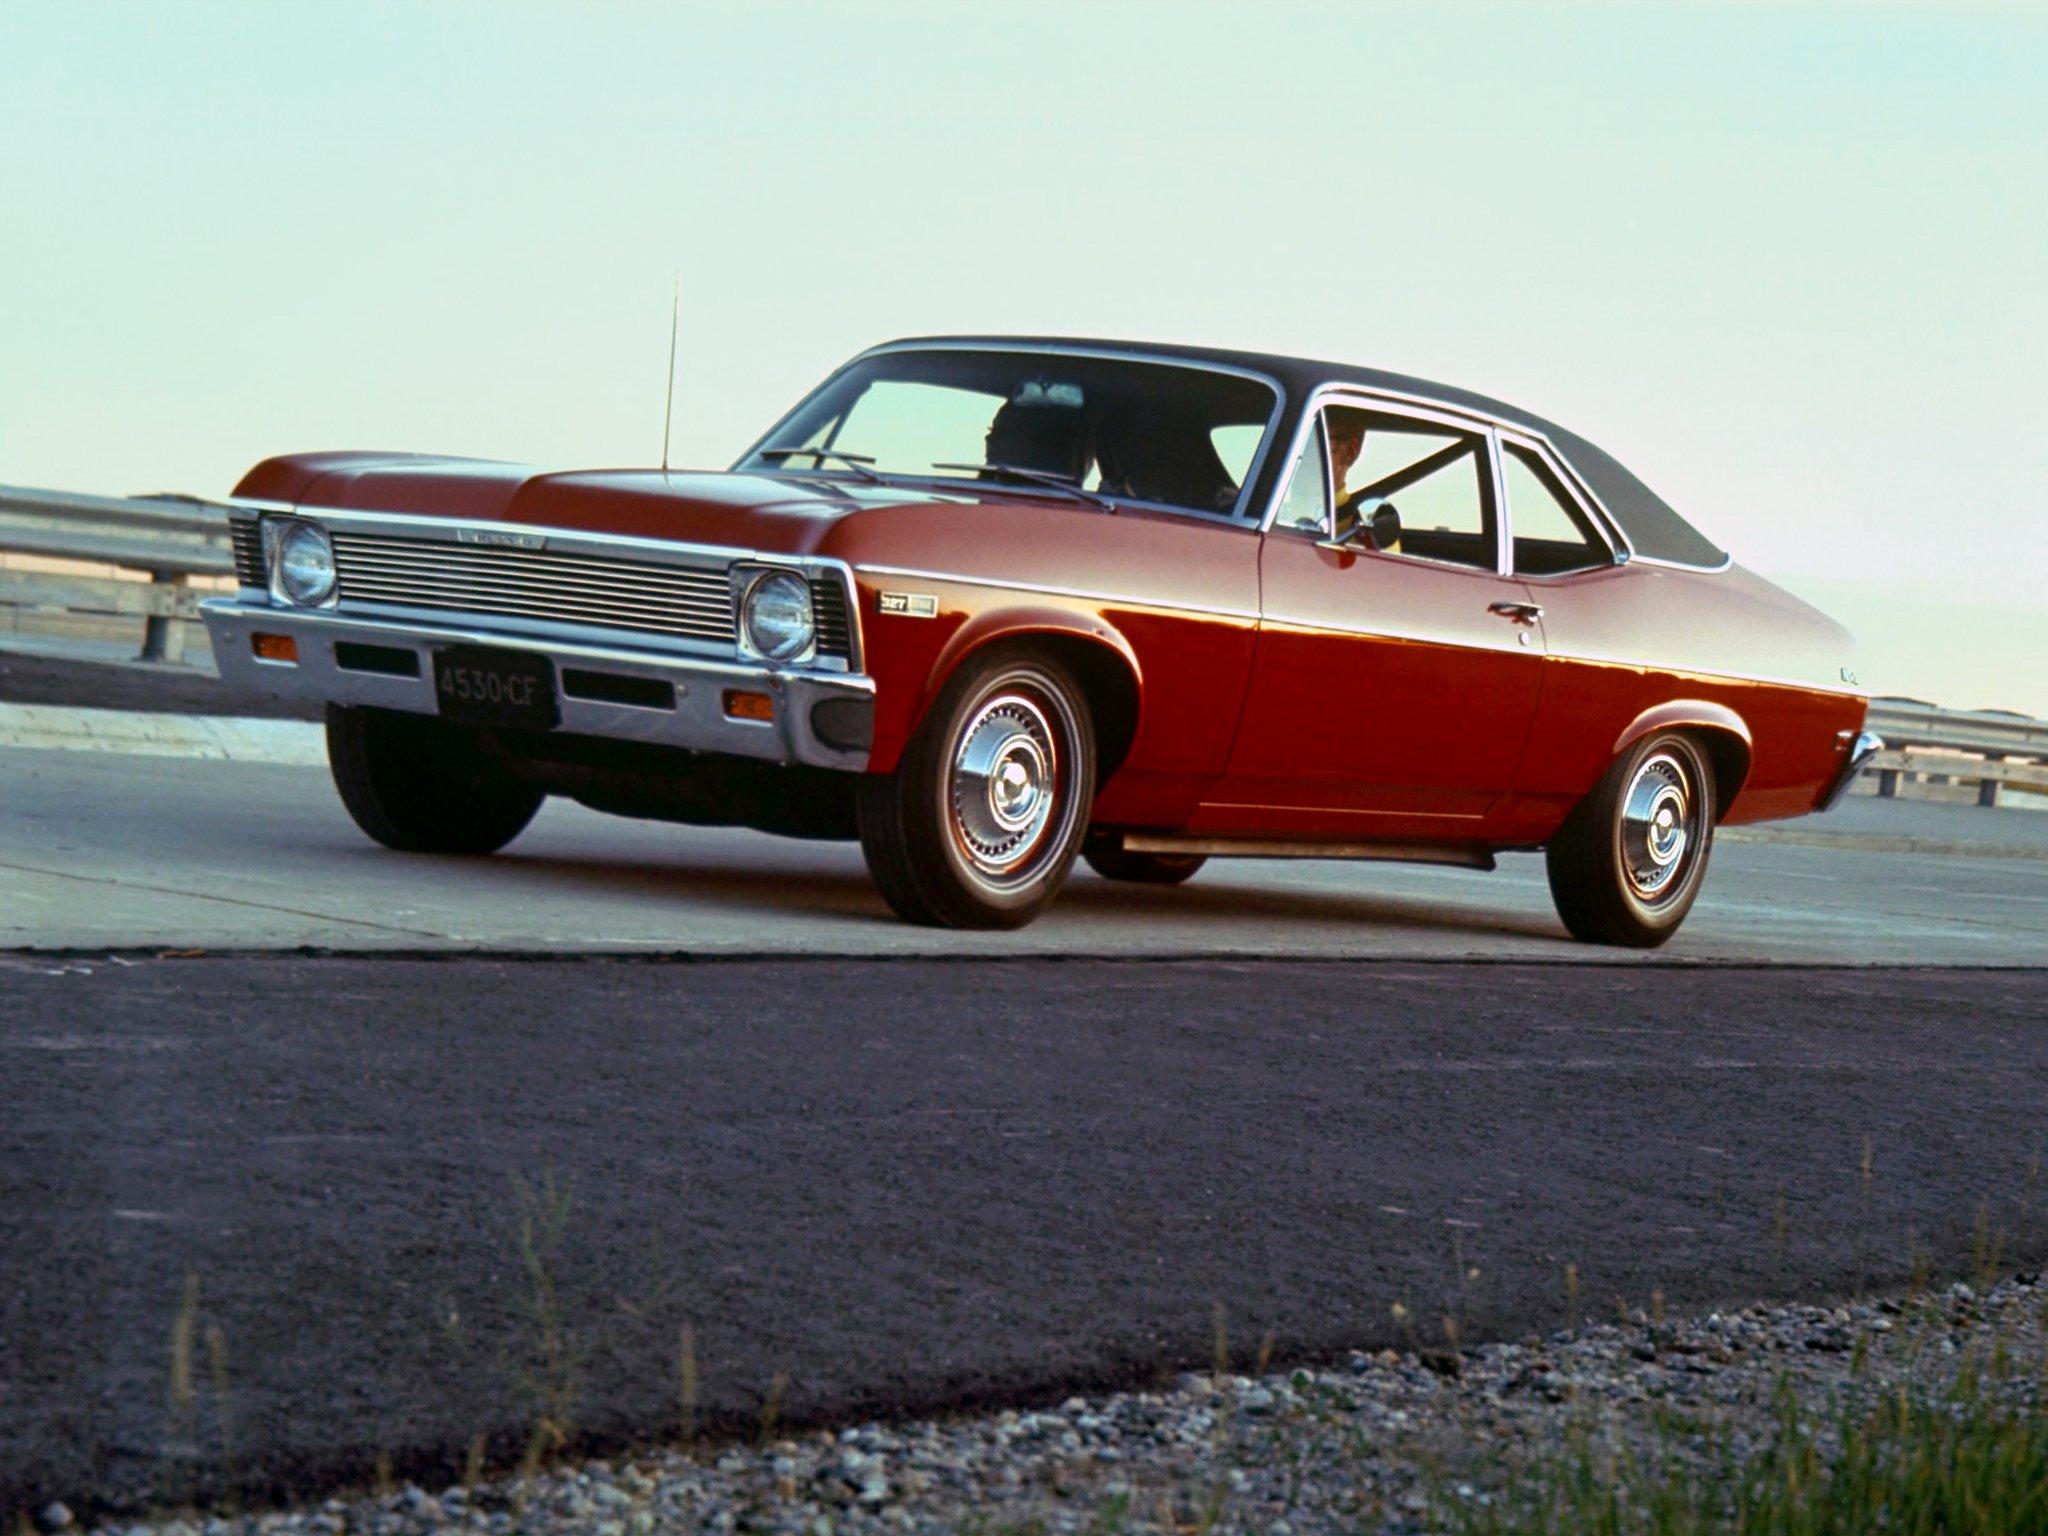 1968 Chevrolet Chevy Ii Nova 327 Coupe 11427 Muscle